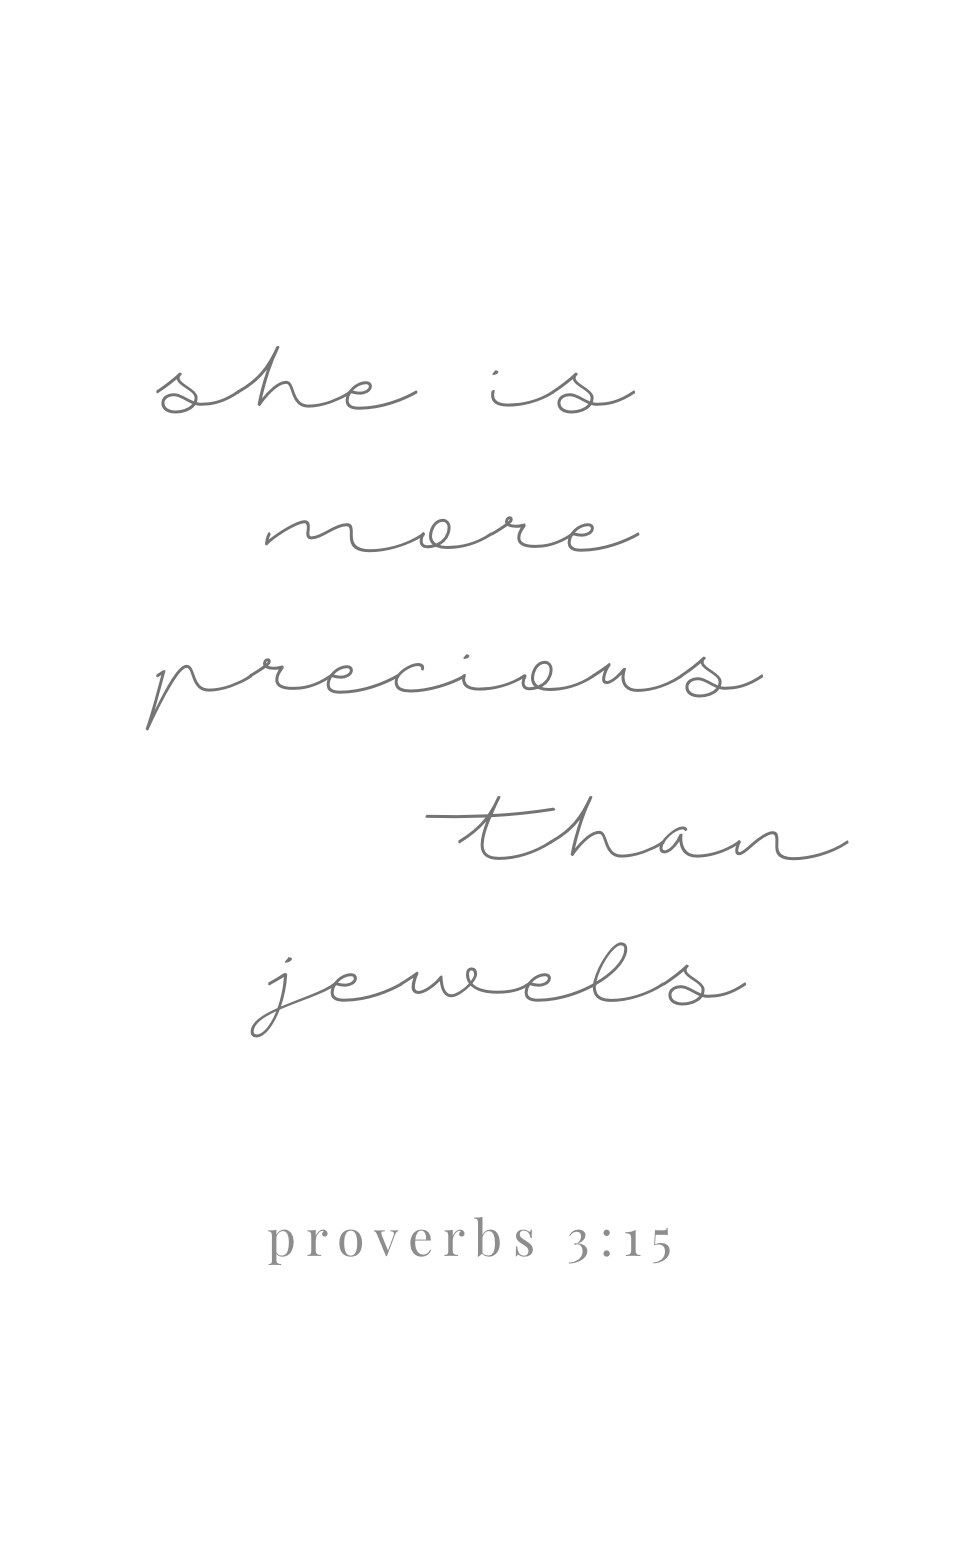 jewels3.png